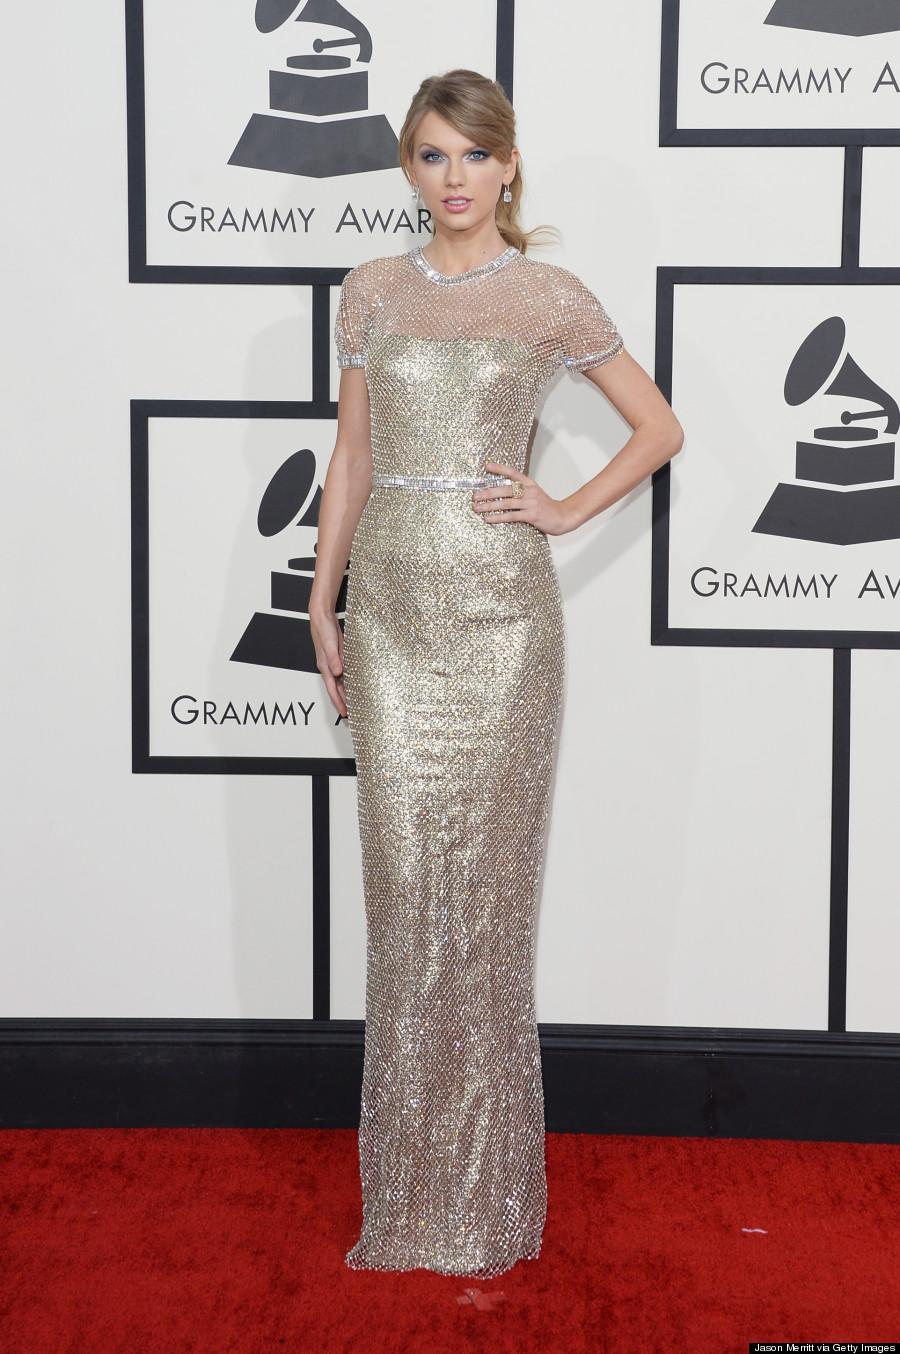 Taylor Swift Grammy 2014 Dress